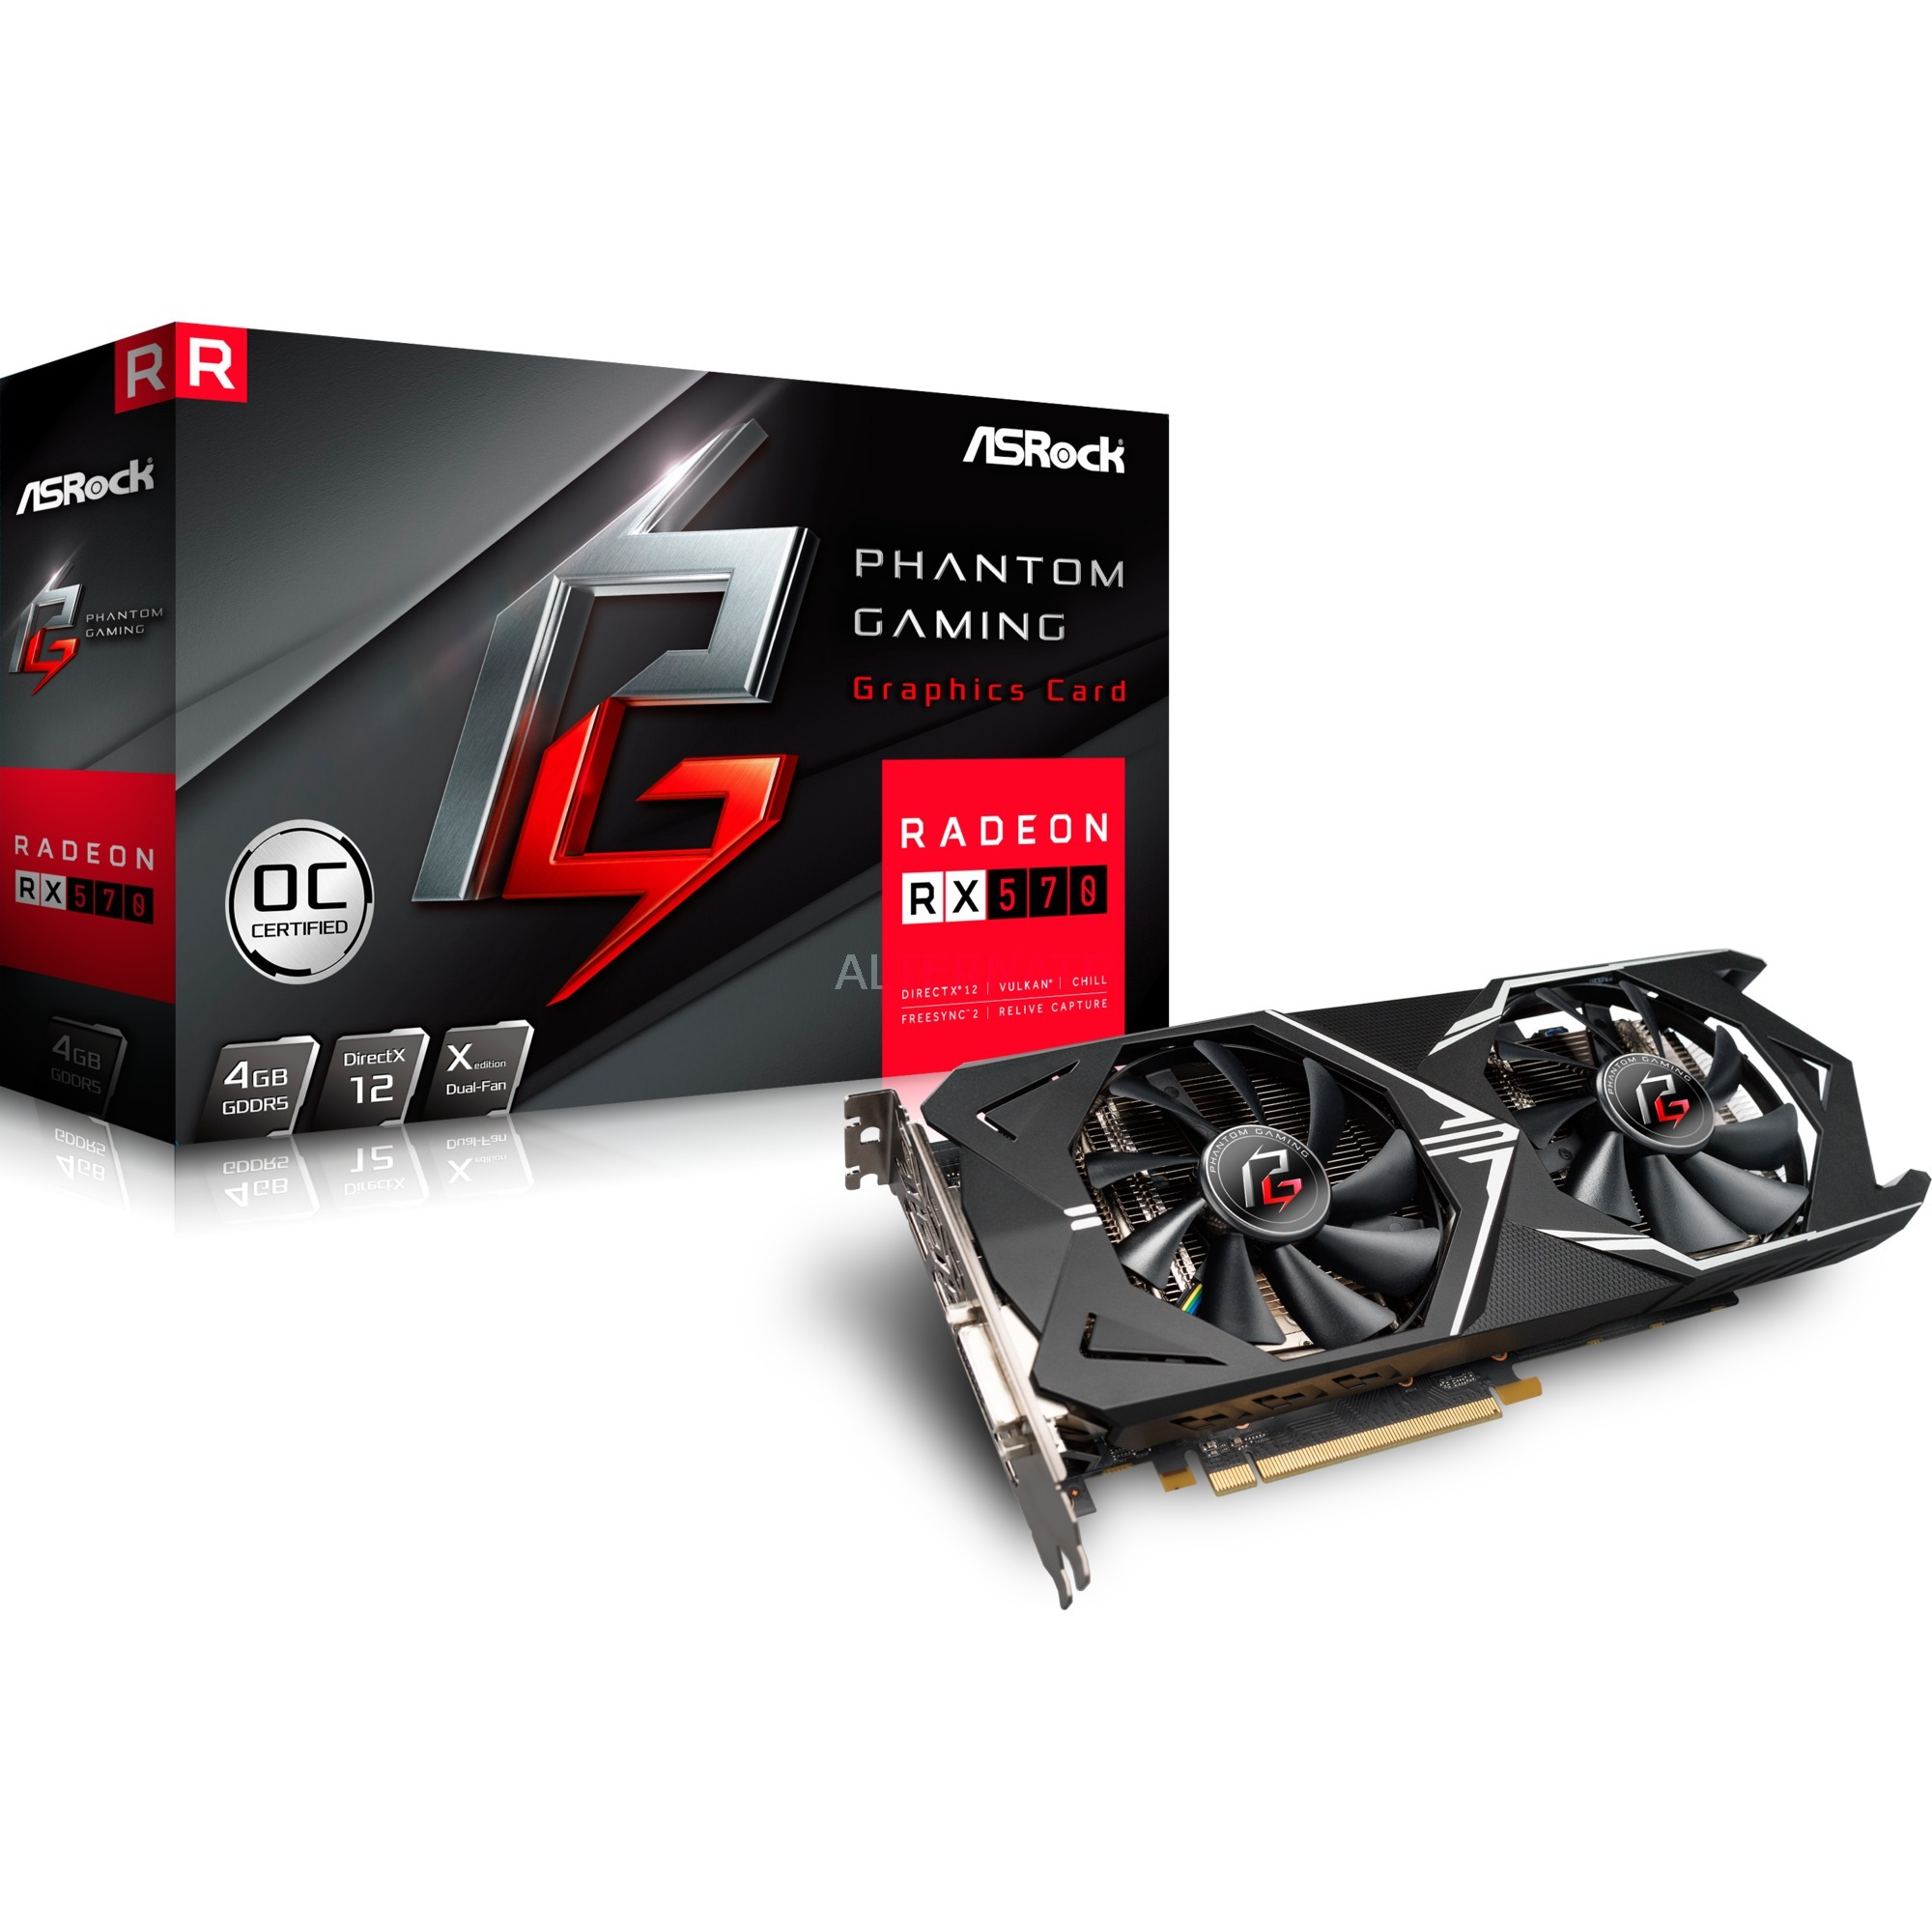 90-GA0800-00UANF Radeon RX 570 4GB GDDR5 tarjeta gráfica